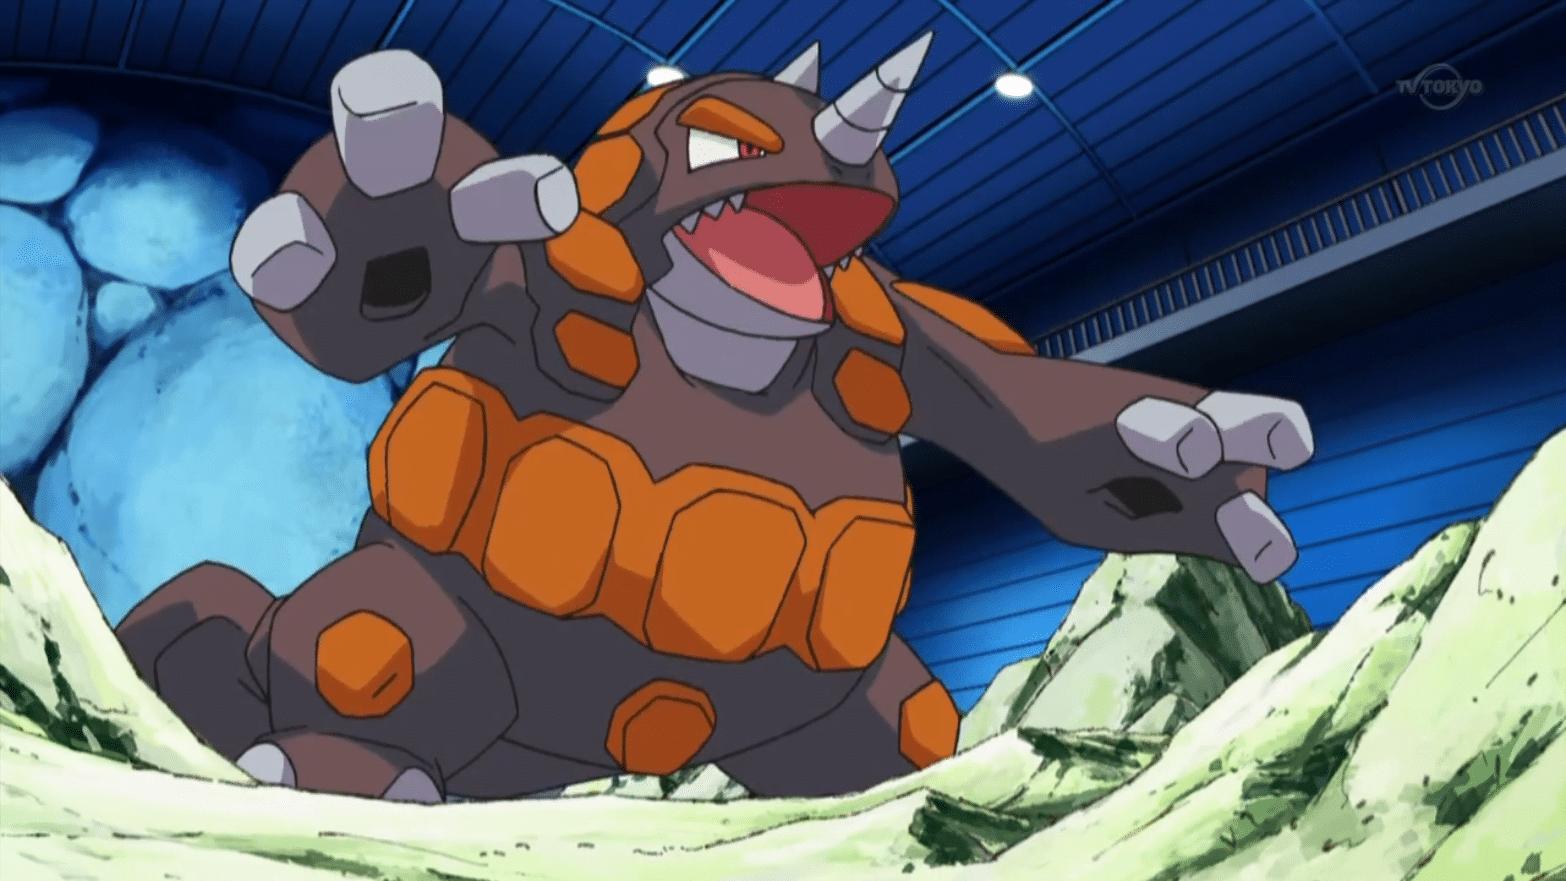 Pokemon GO Cómo evolucionar a Rhydon en Rhyperior